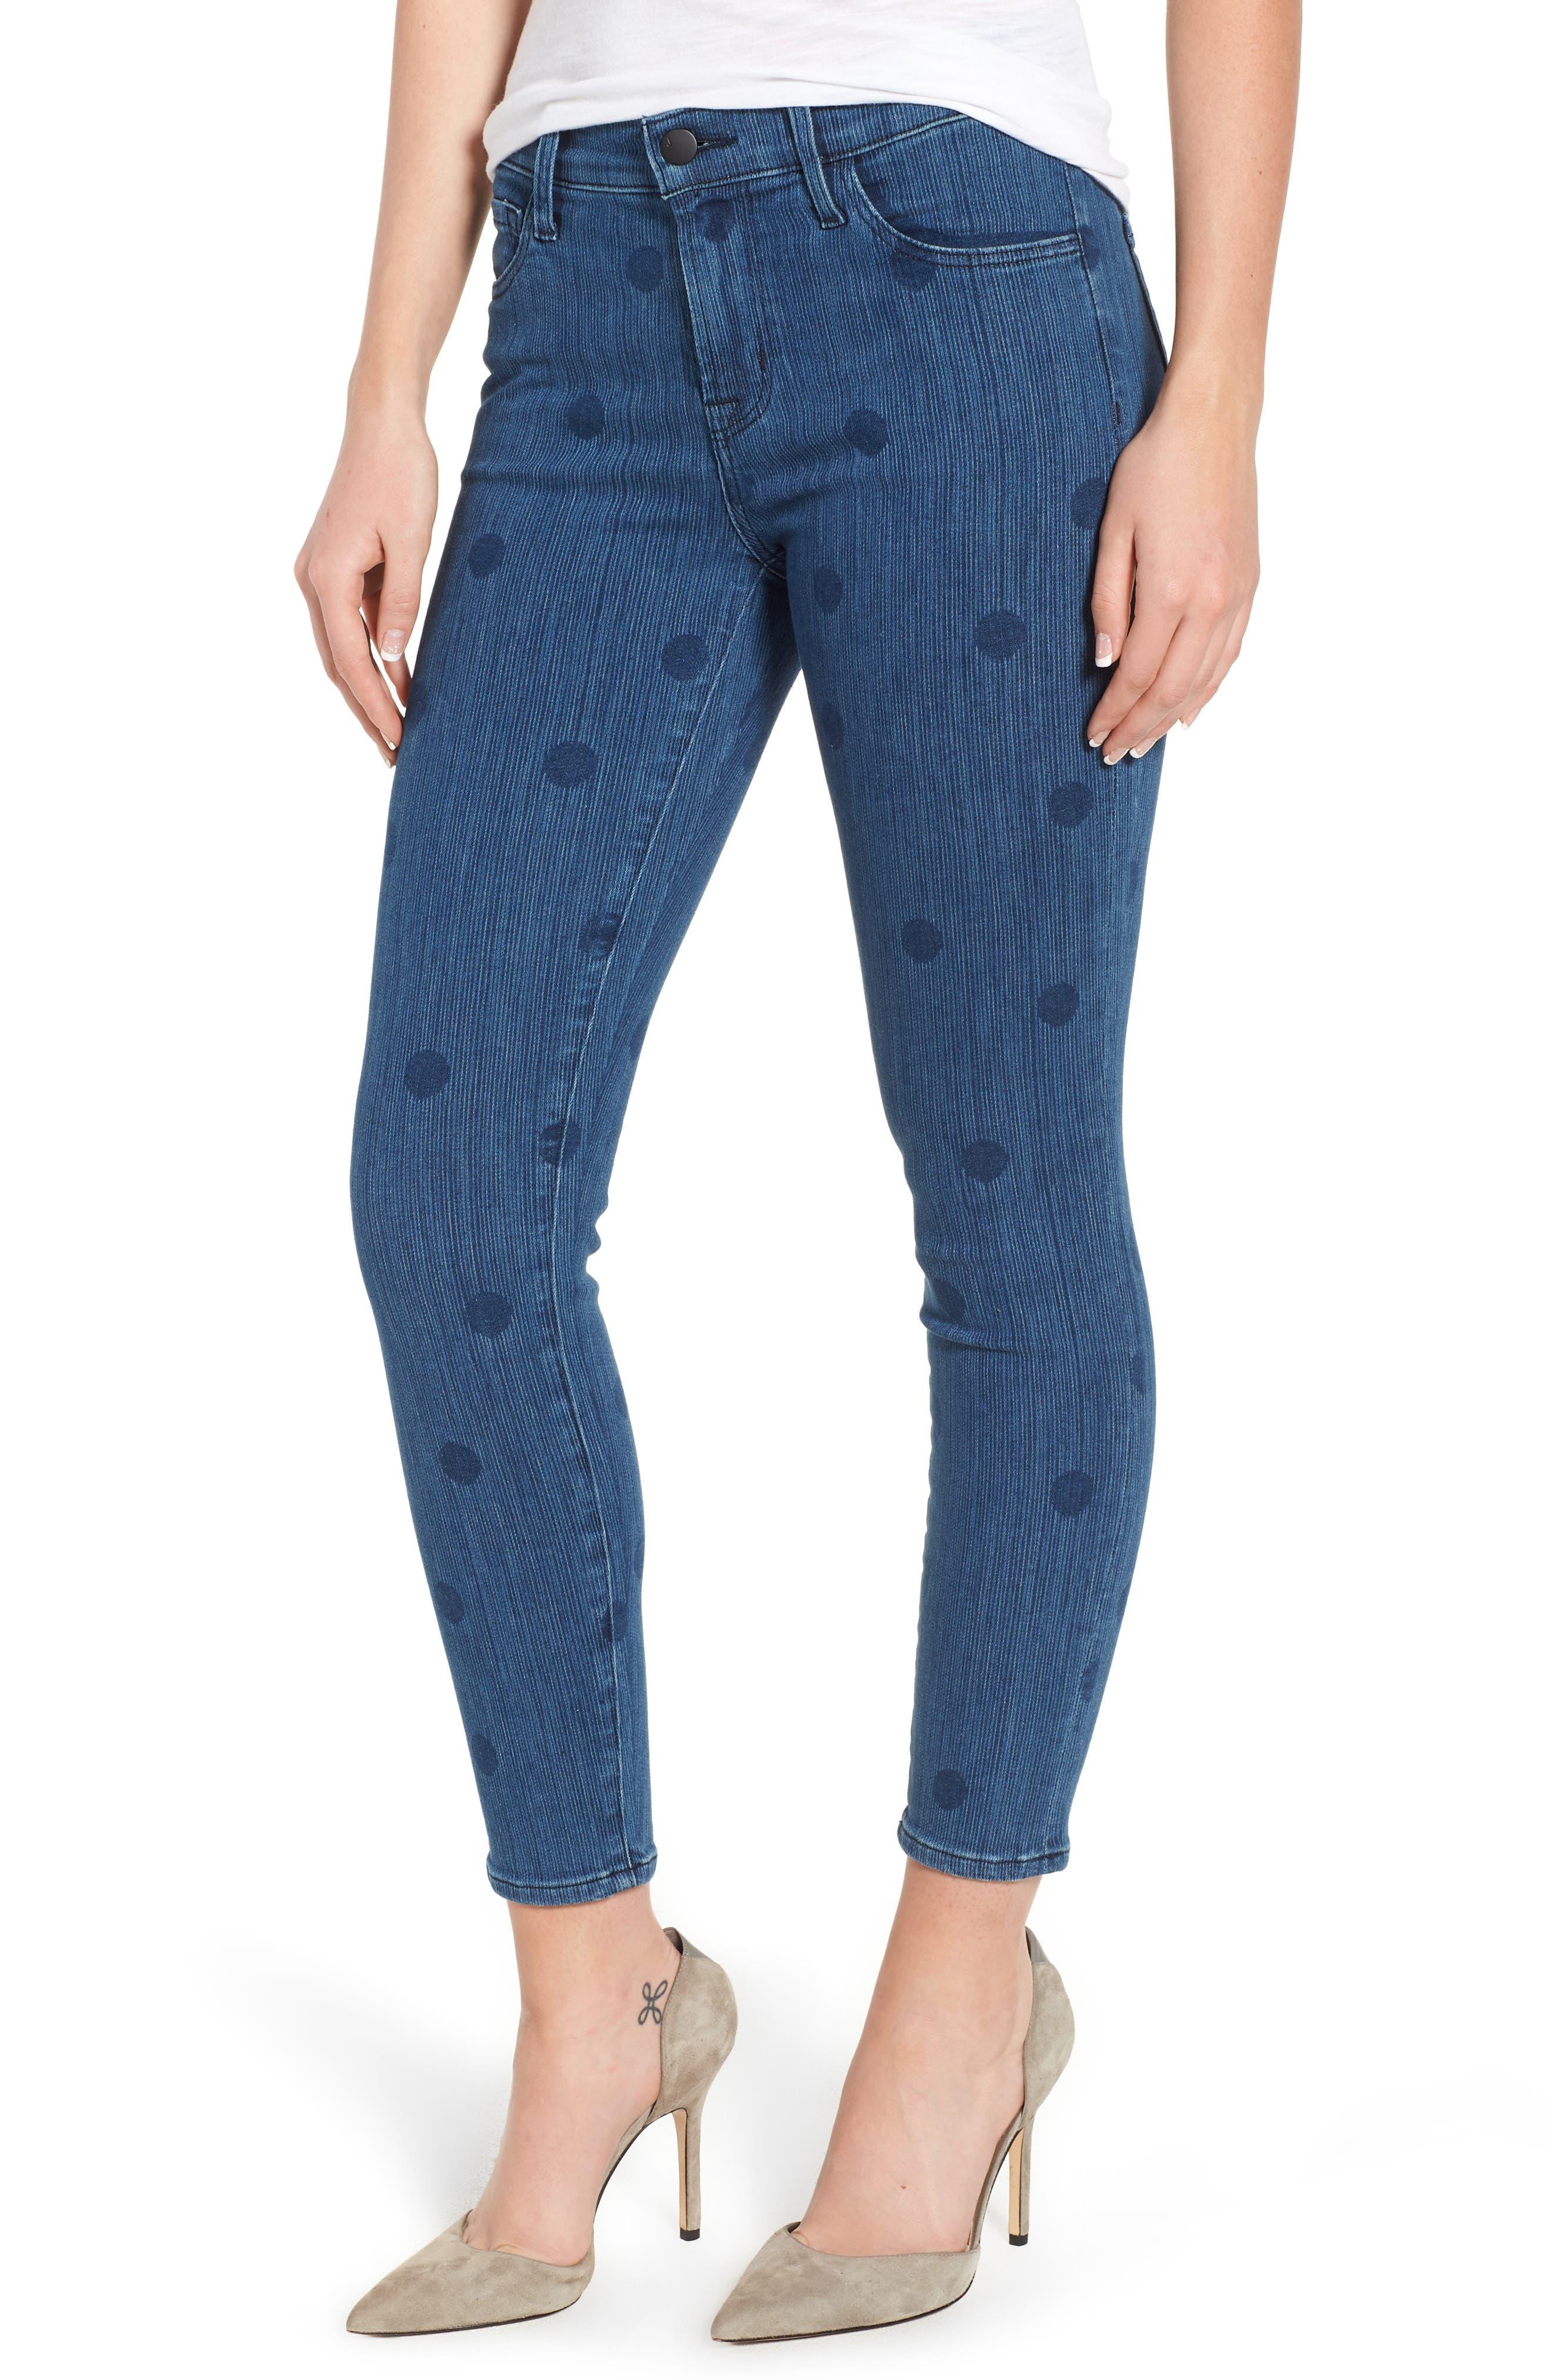 835 Capri Skinny Jeans,                             Main thumbnail 1, color,                             400